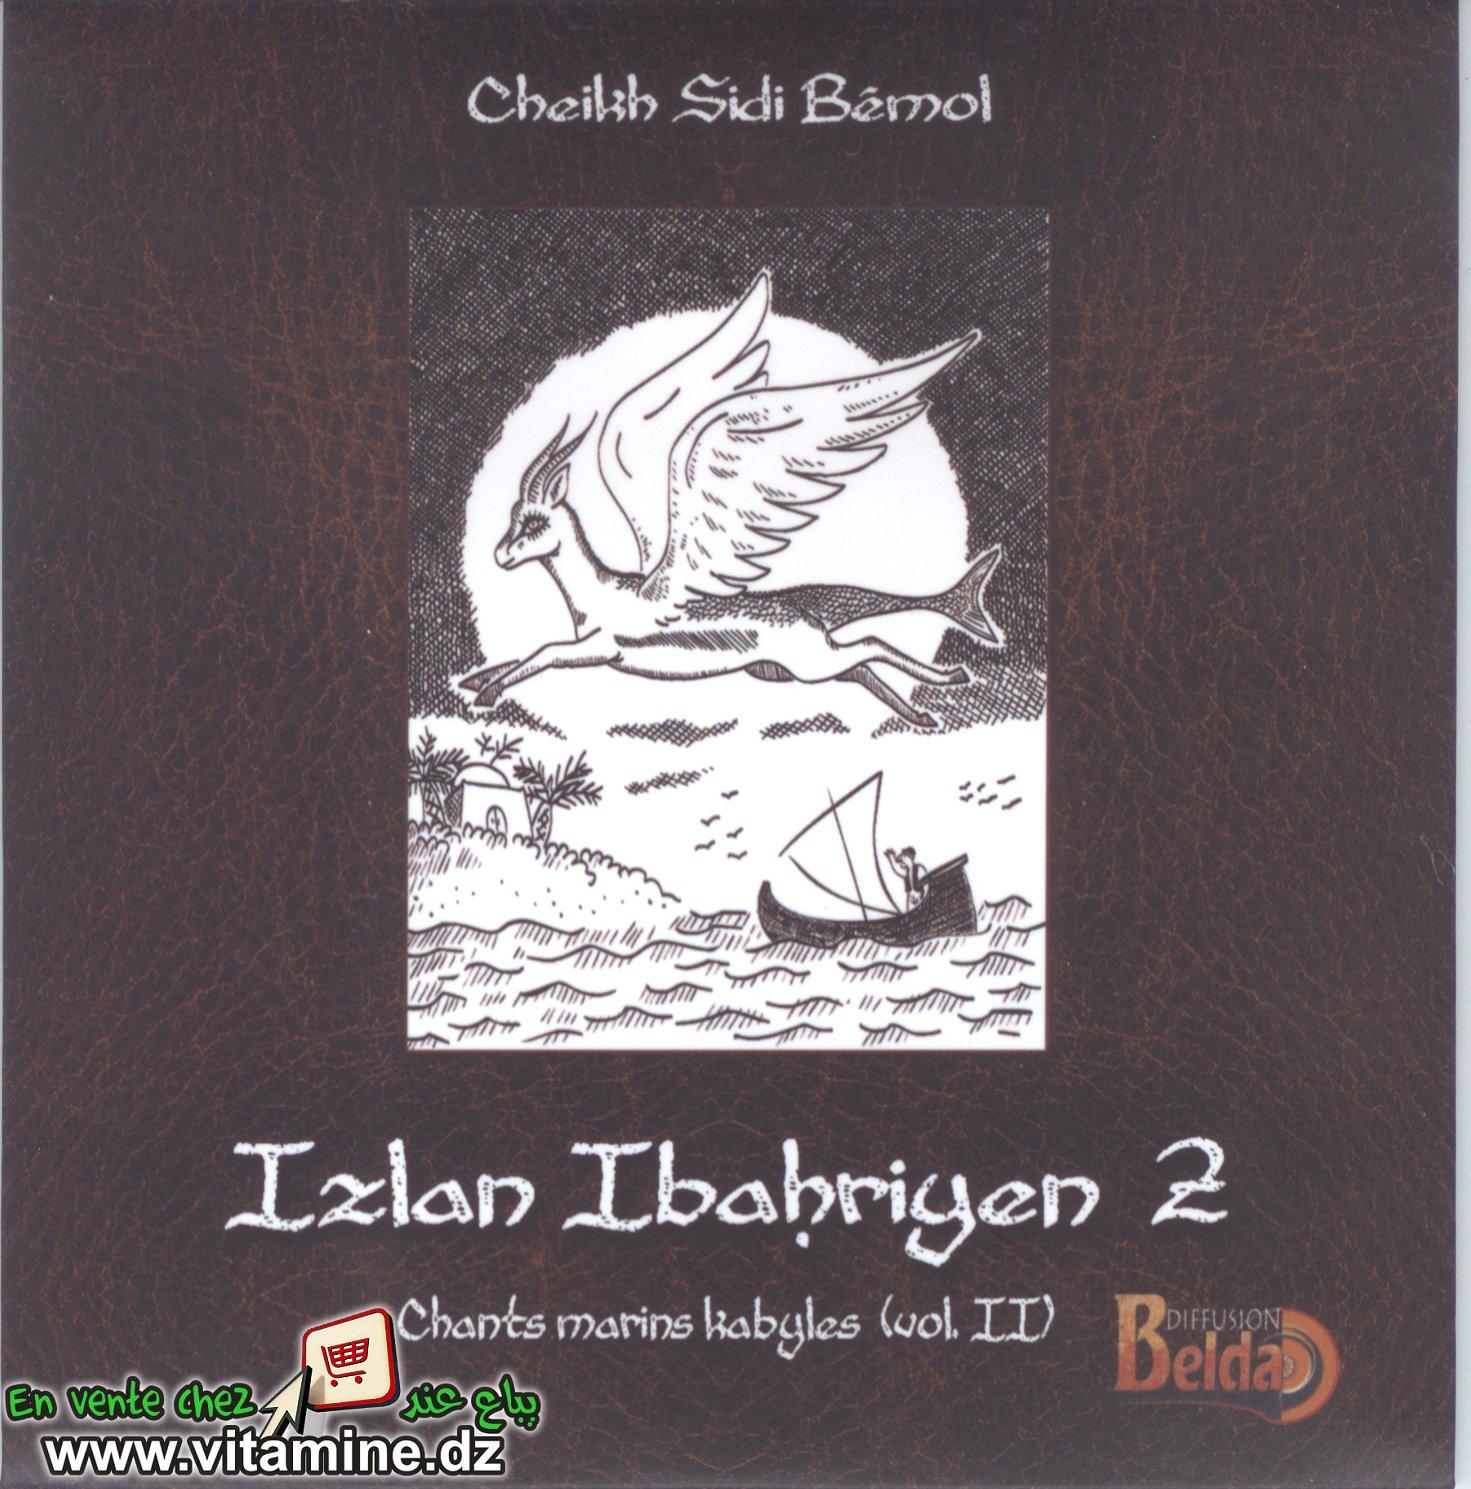 Cheikh Sidi Bémol - izlan ibahriyen vol 2